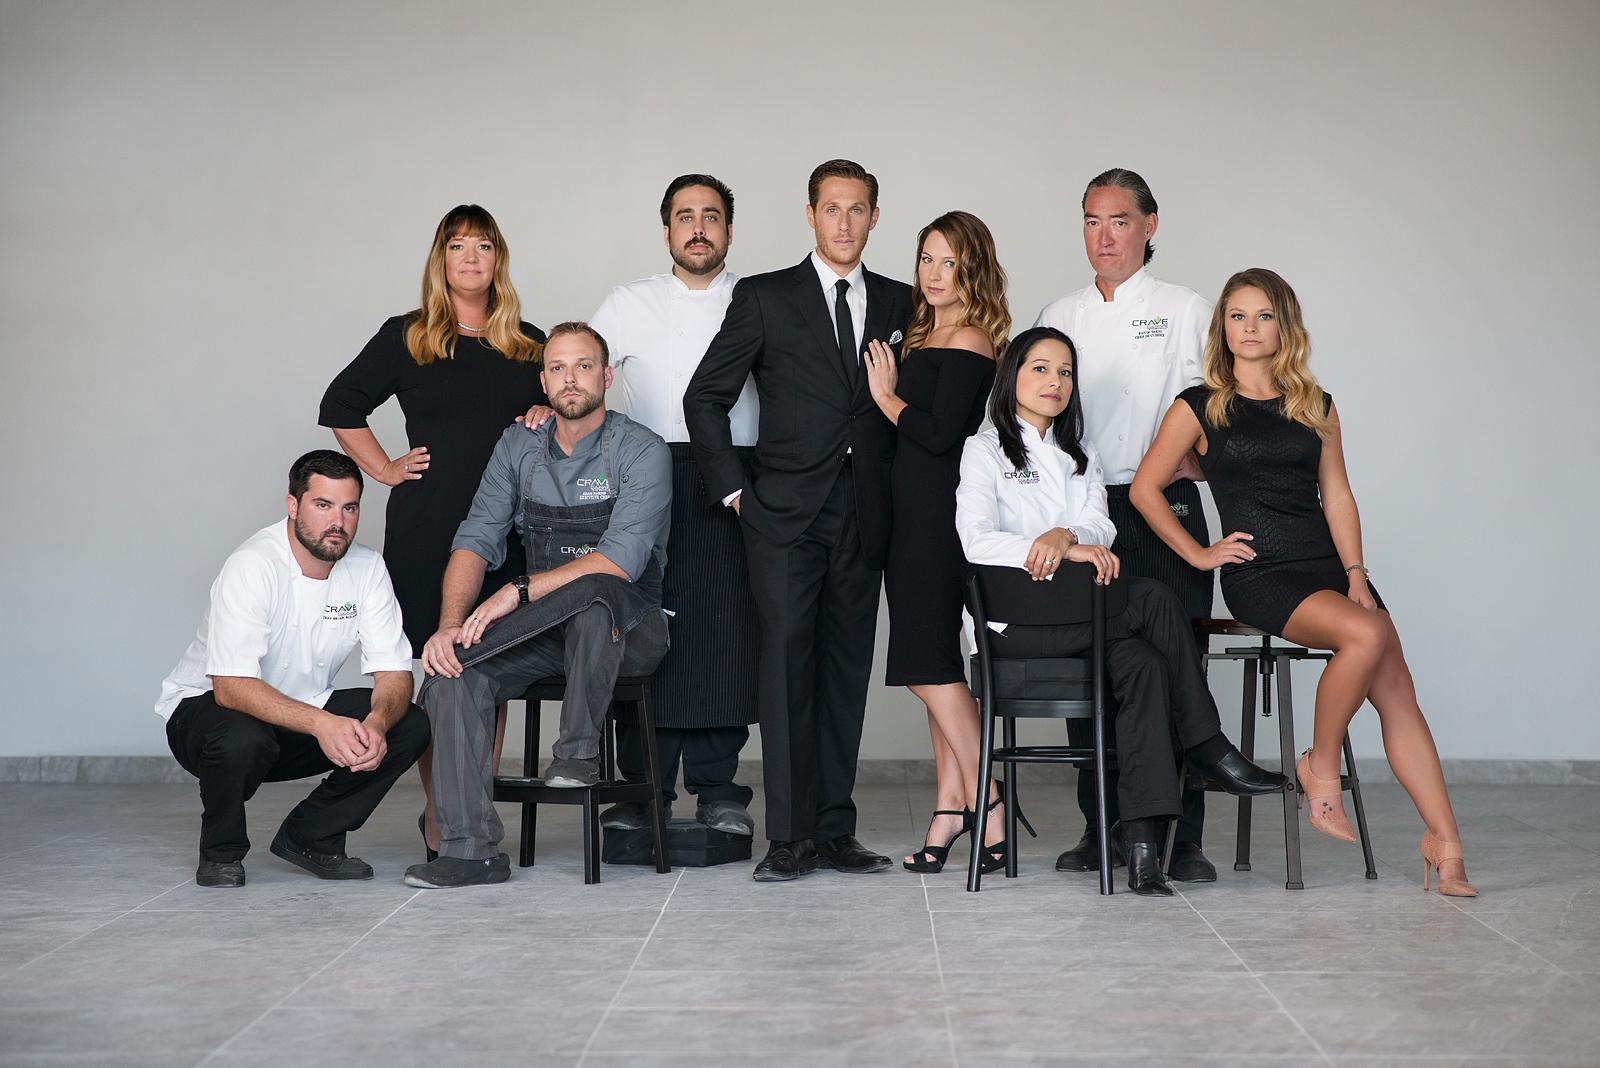 16-large-team-beautiful-innovative-trendy-megan-dipiero-photography-naples-branding.jpg